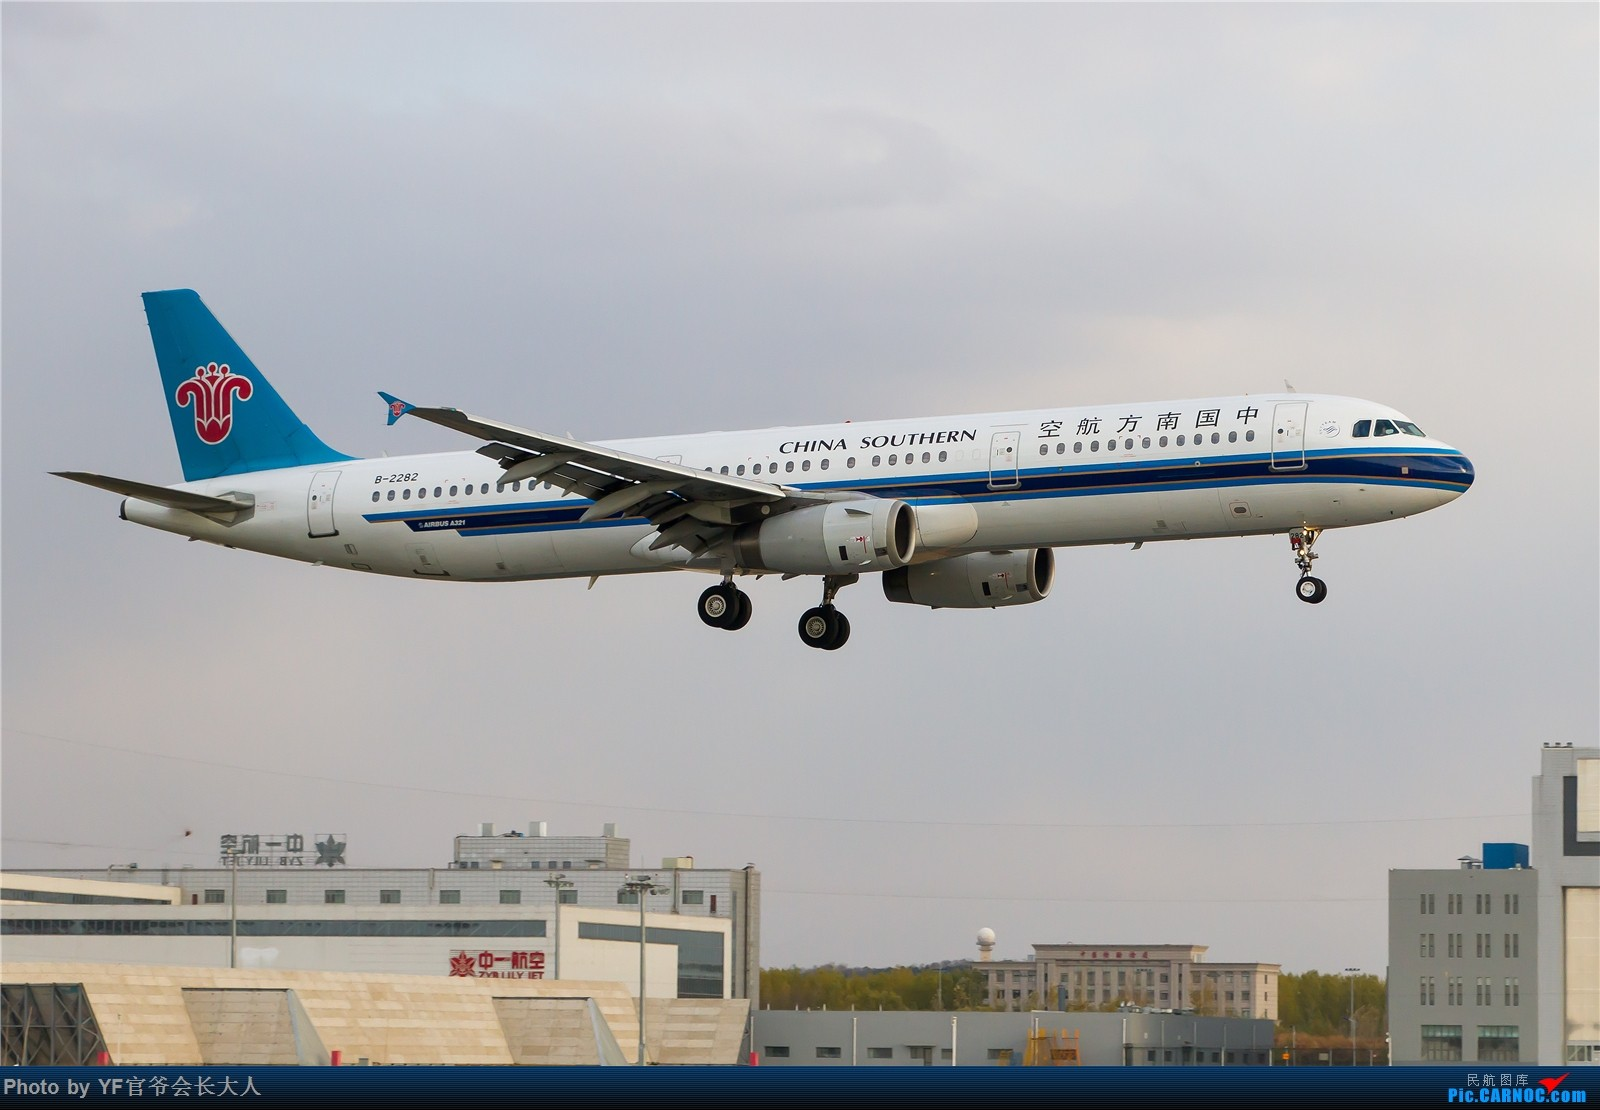 Re:[原创]【ZYTX】【1600*1066】论坛首发:俄罗斯艾菲航空公司波音757-28A,注册号:EI-EWT,还有757斯基以及最近新拍机点拍的一些好货 AIRBUS A321-200 B-2282 中国沈阳桃仙国际机场